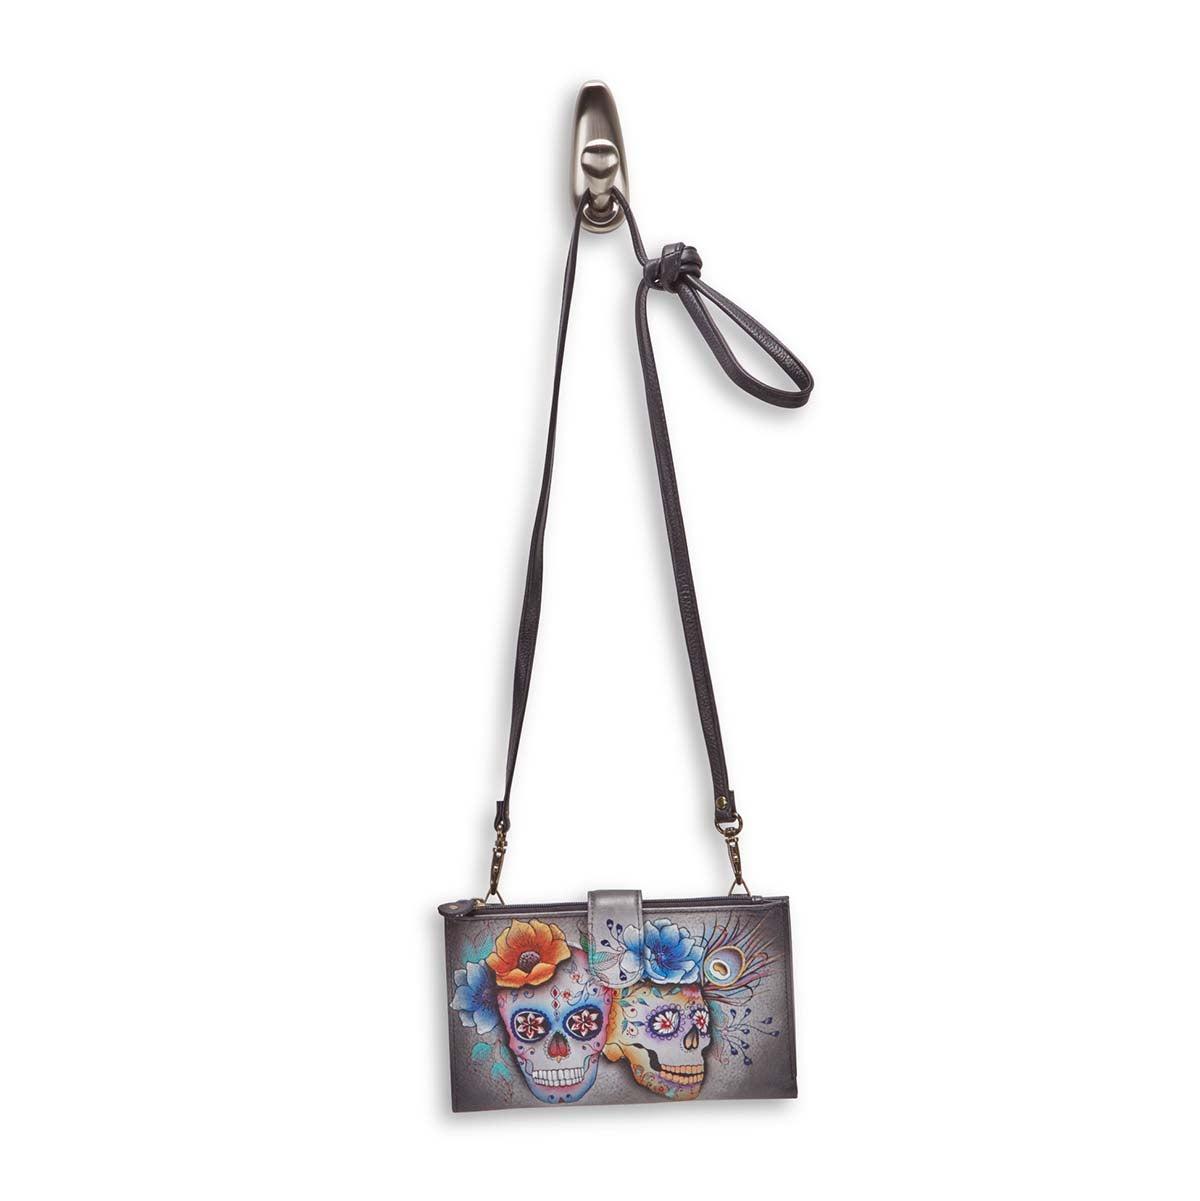 Painted Calaveras de Azucar phncs/wallet